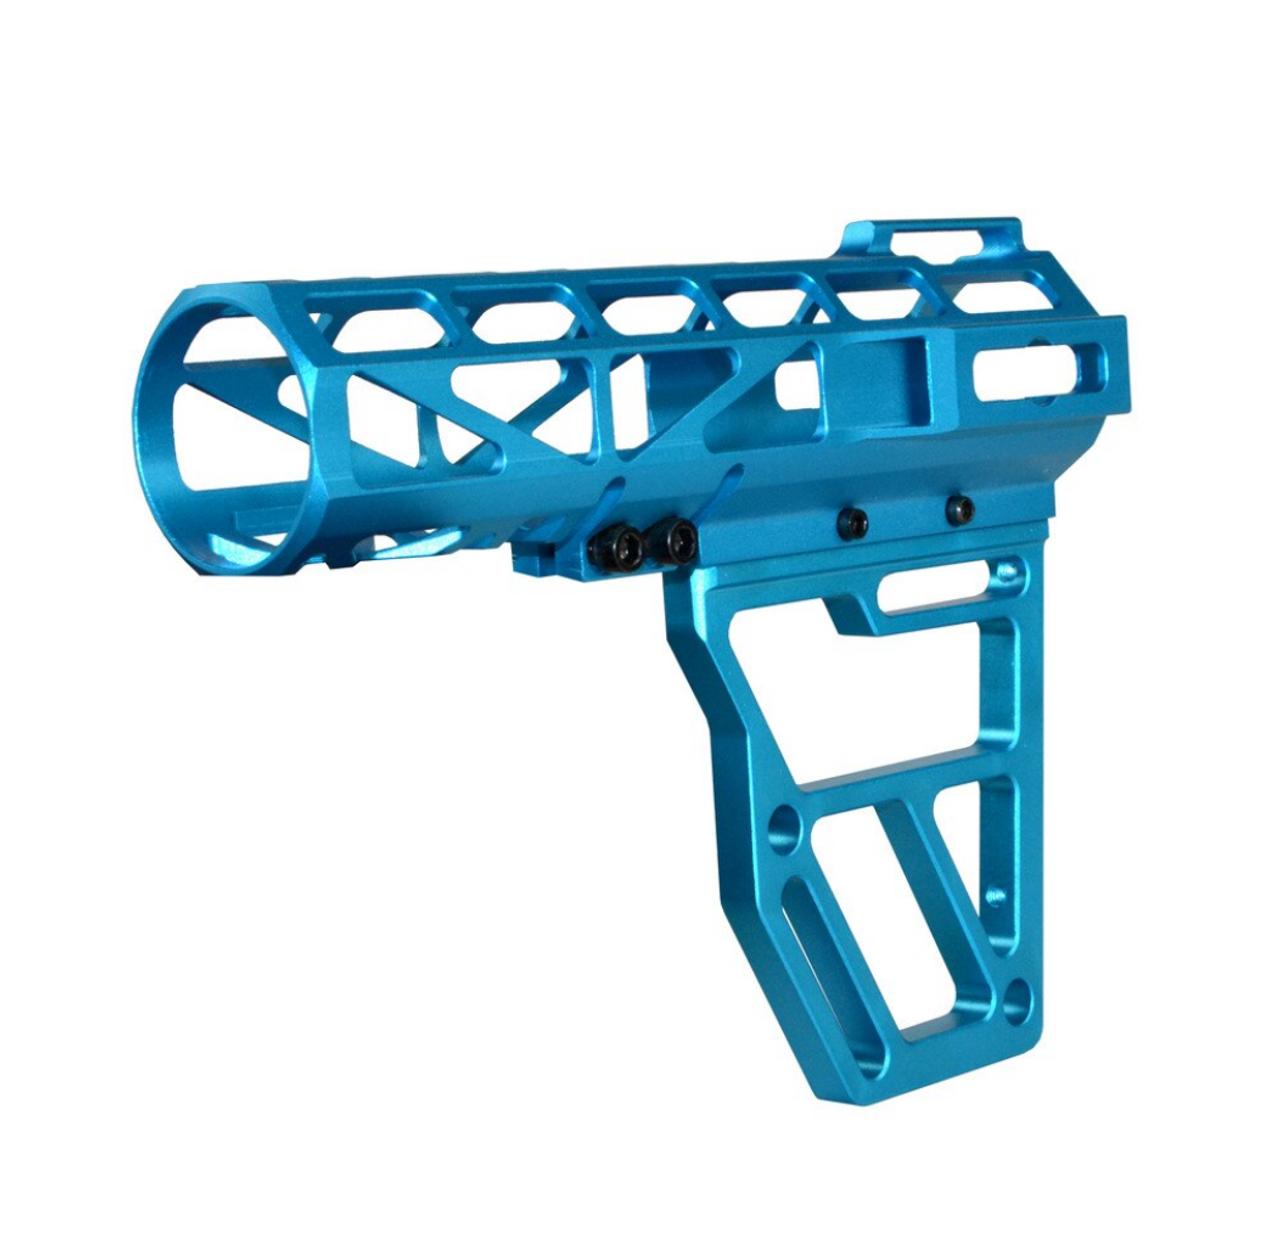 Skeletonized Pistol Brace Stabilizer, Blue Anodized Aluminum